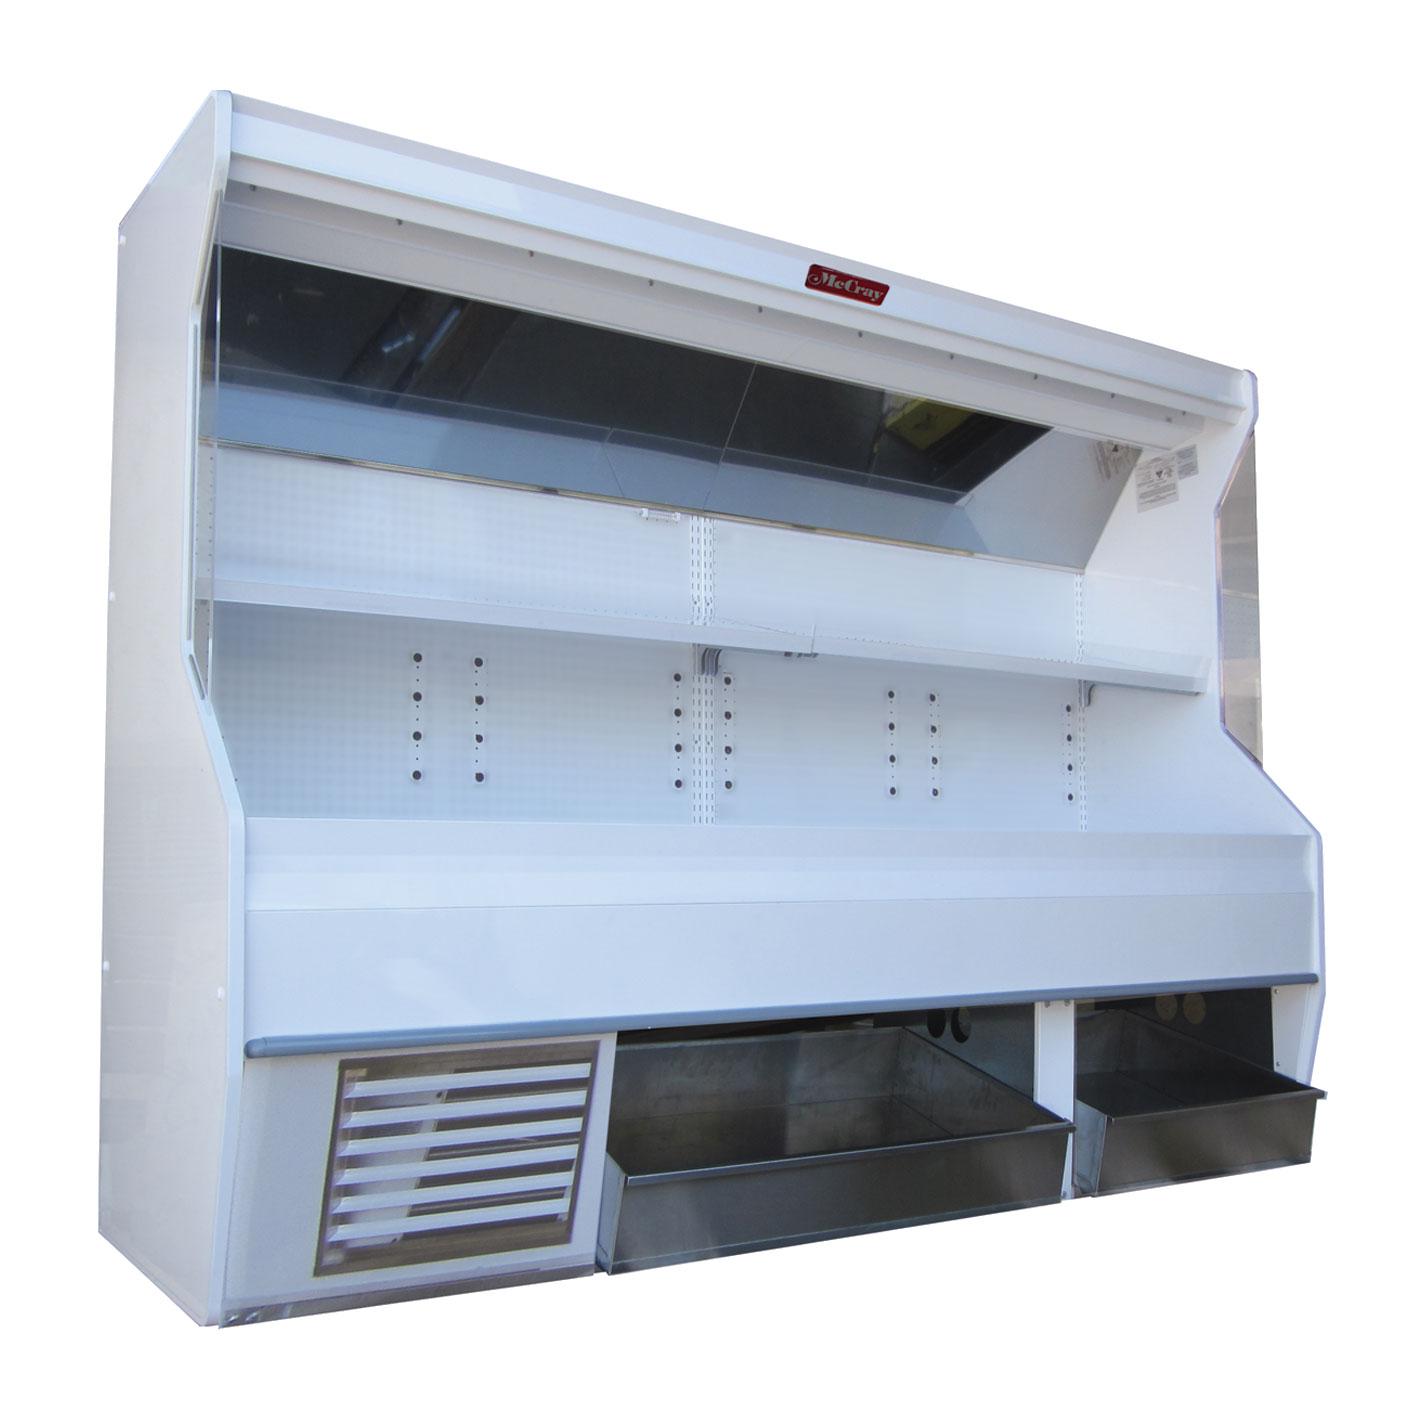 Howard-McCray R-P32E-12S-BINS-LED display case, produce